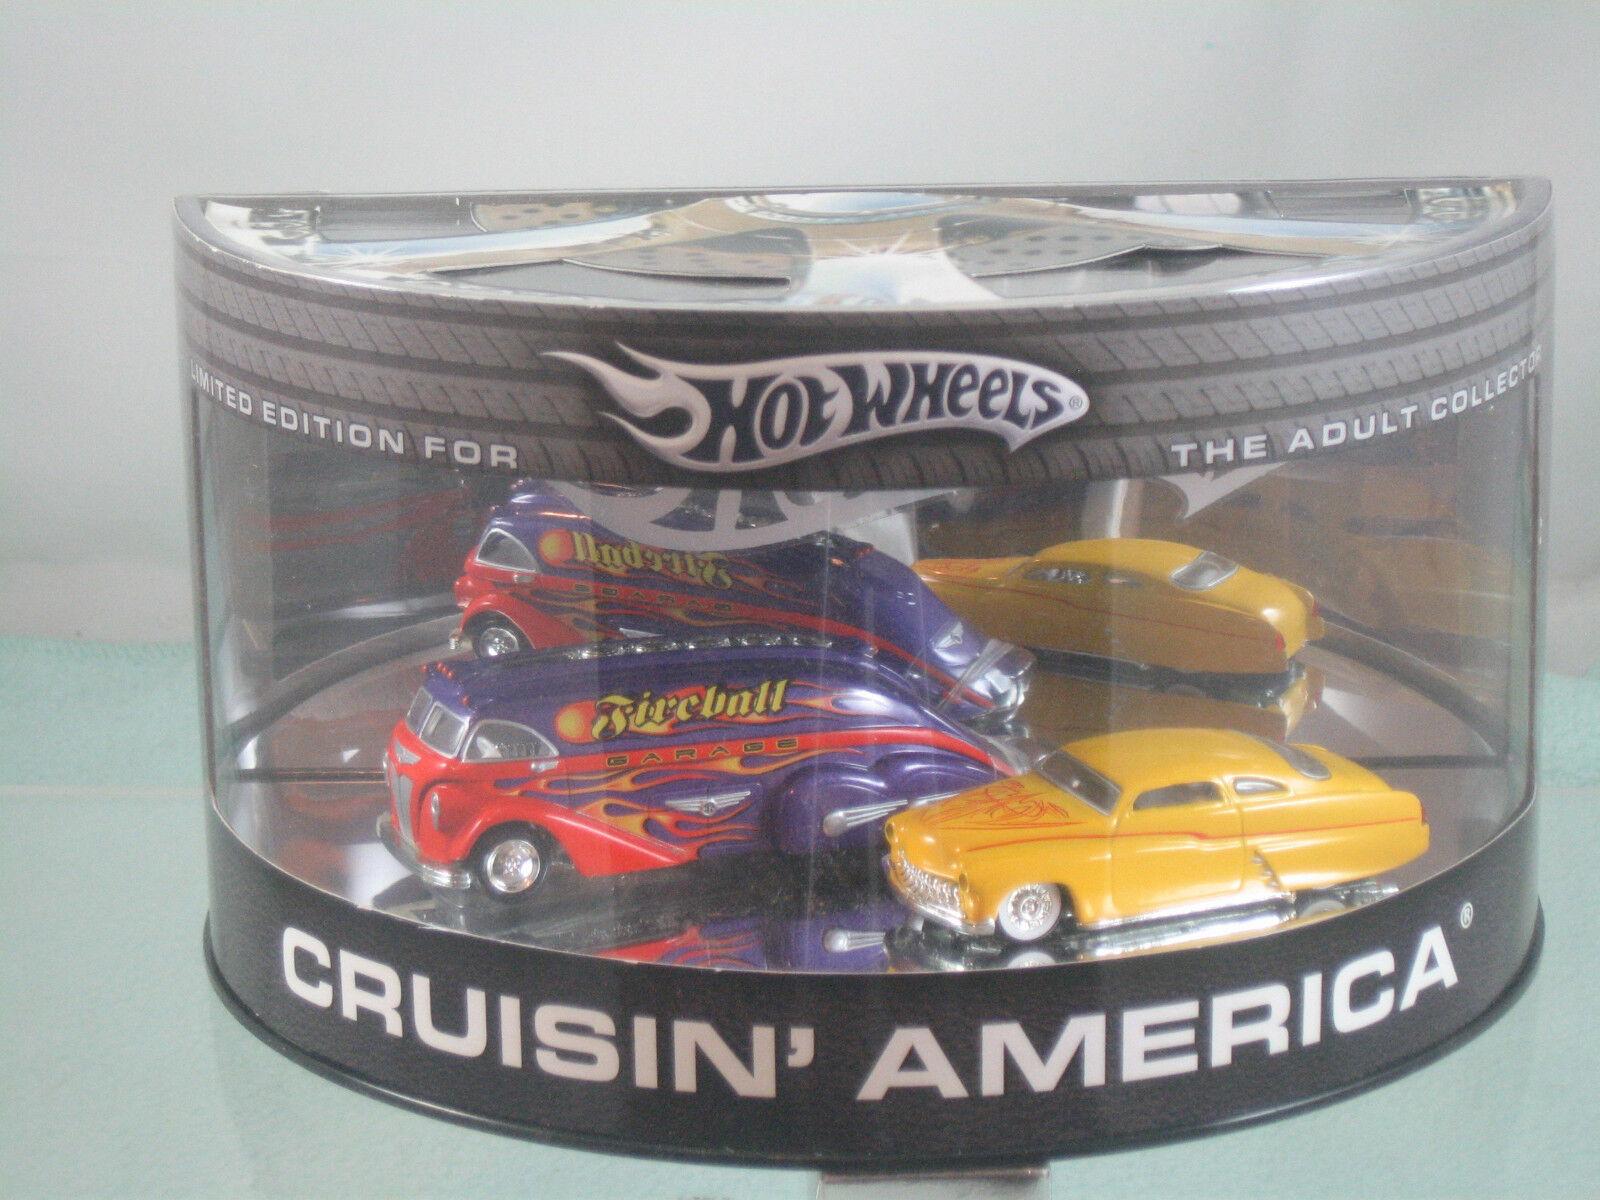 Hot Wheels Cruisin 'America Edición limitada conjunto de coche